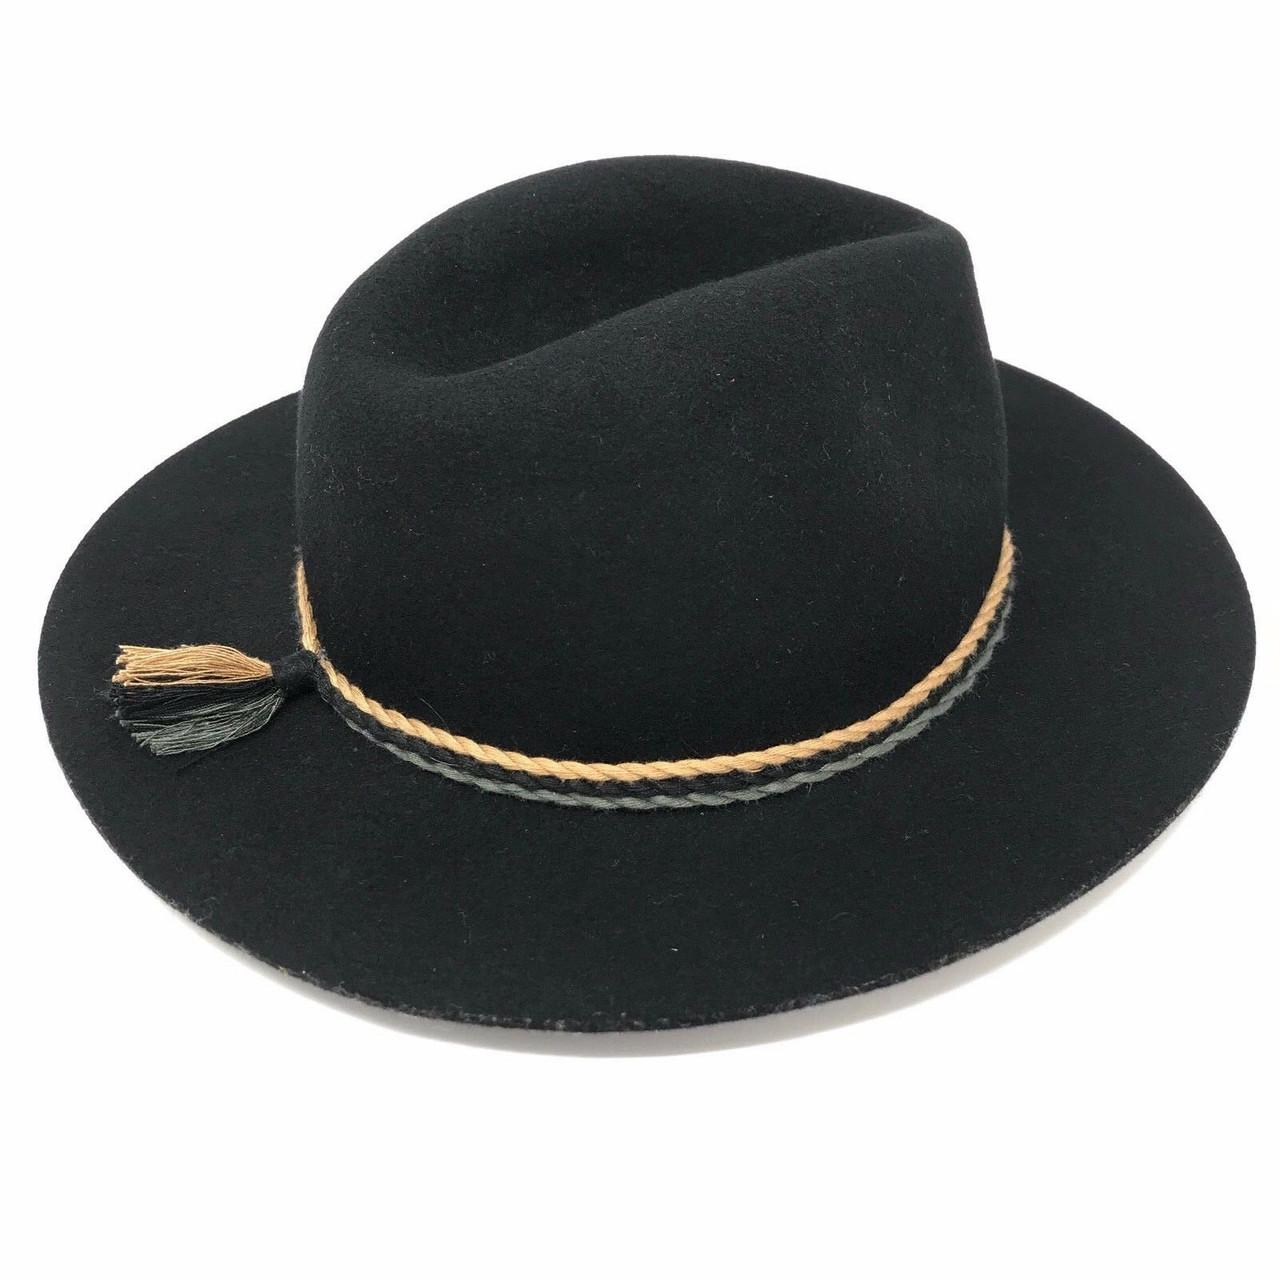 27189e4ba Black Felt Wool Fedora with Rope Trim by Ace of Something